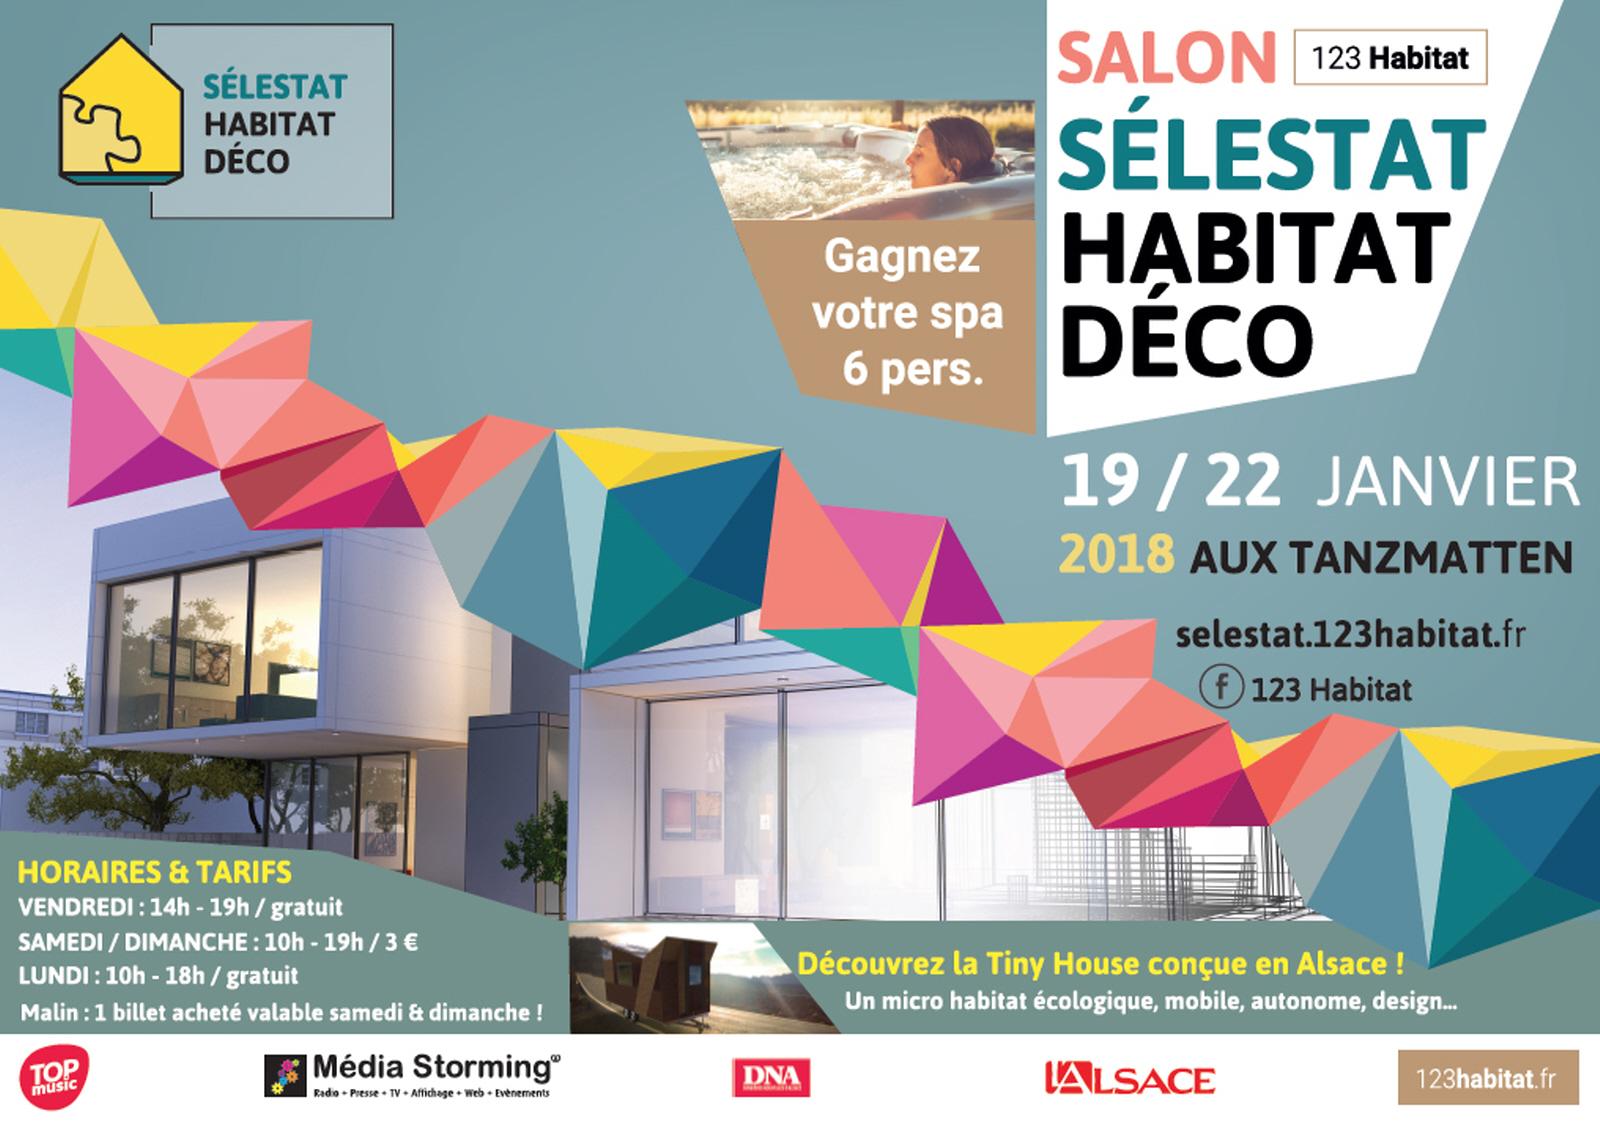 Salon s lestat janvier 2018 maisons prestige for Habitat deco